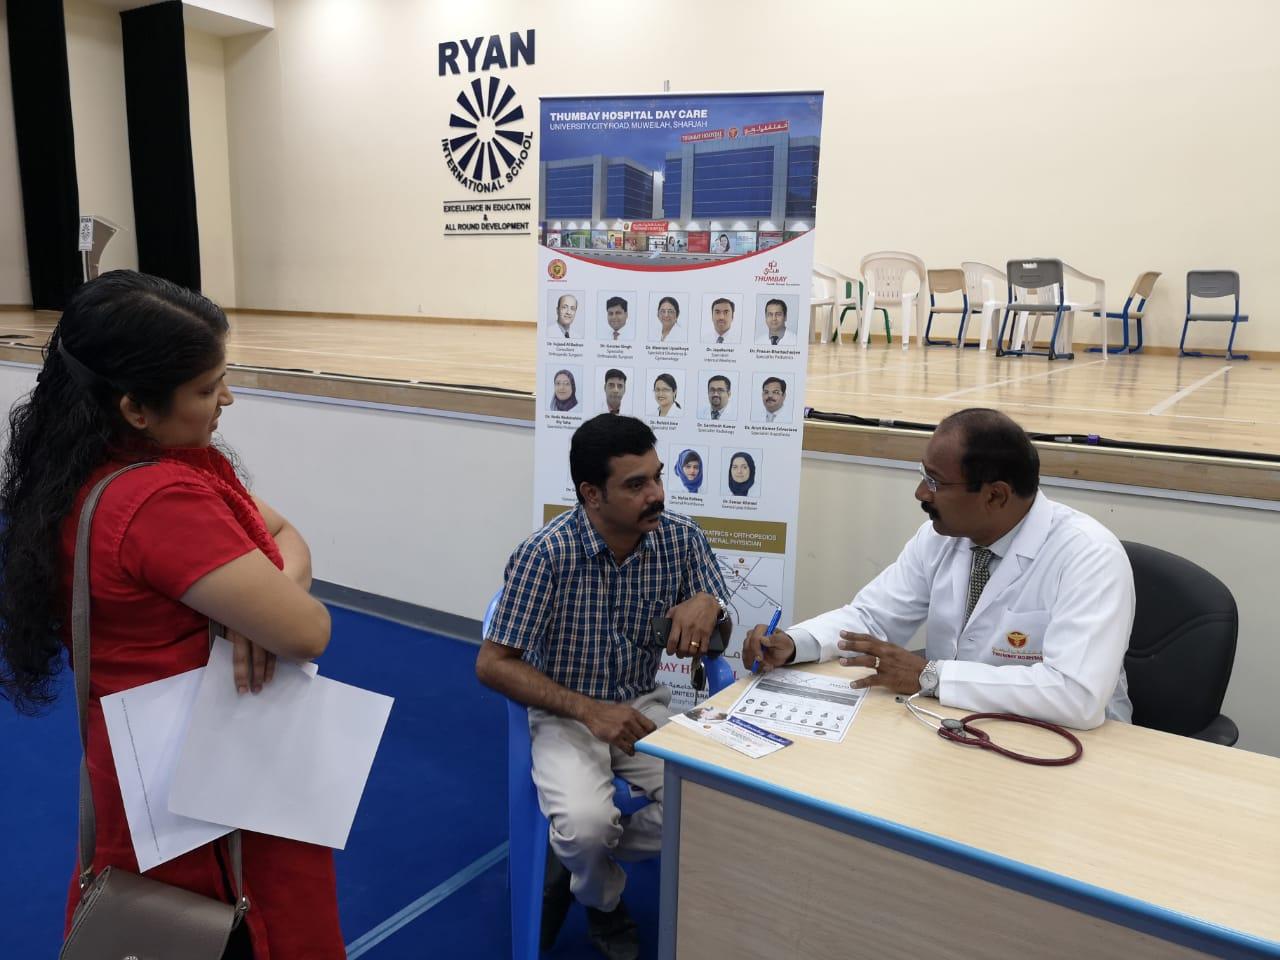 Thumbay Hospital Day Care, Muweilah-Sharjah Conducts Free Health Camp at Ryan International School Sharjah